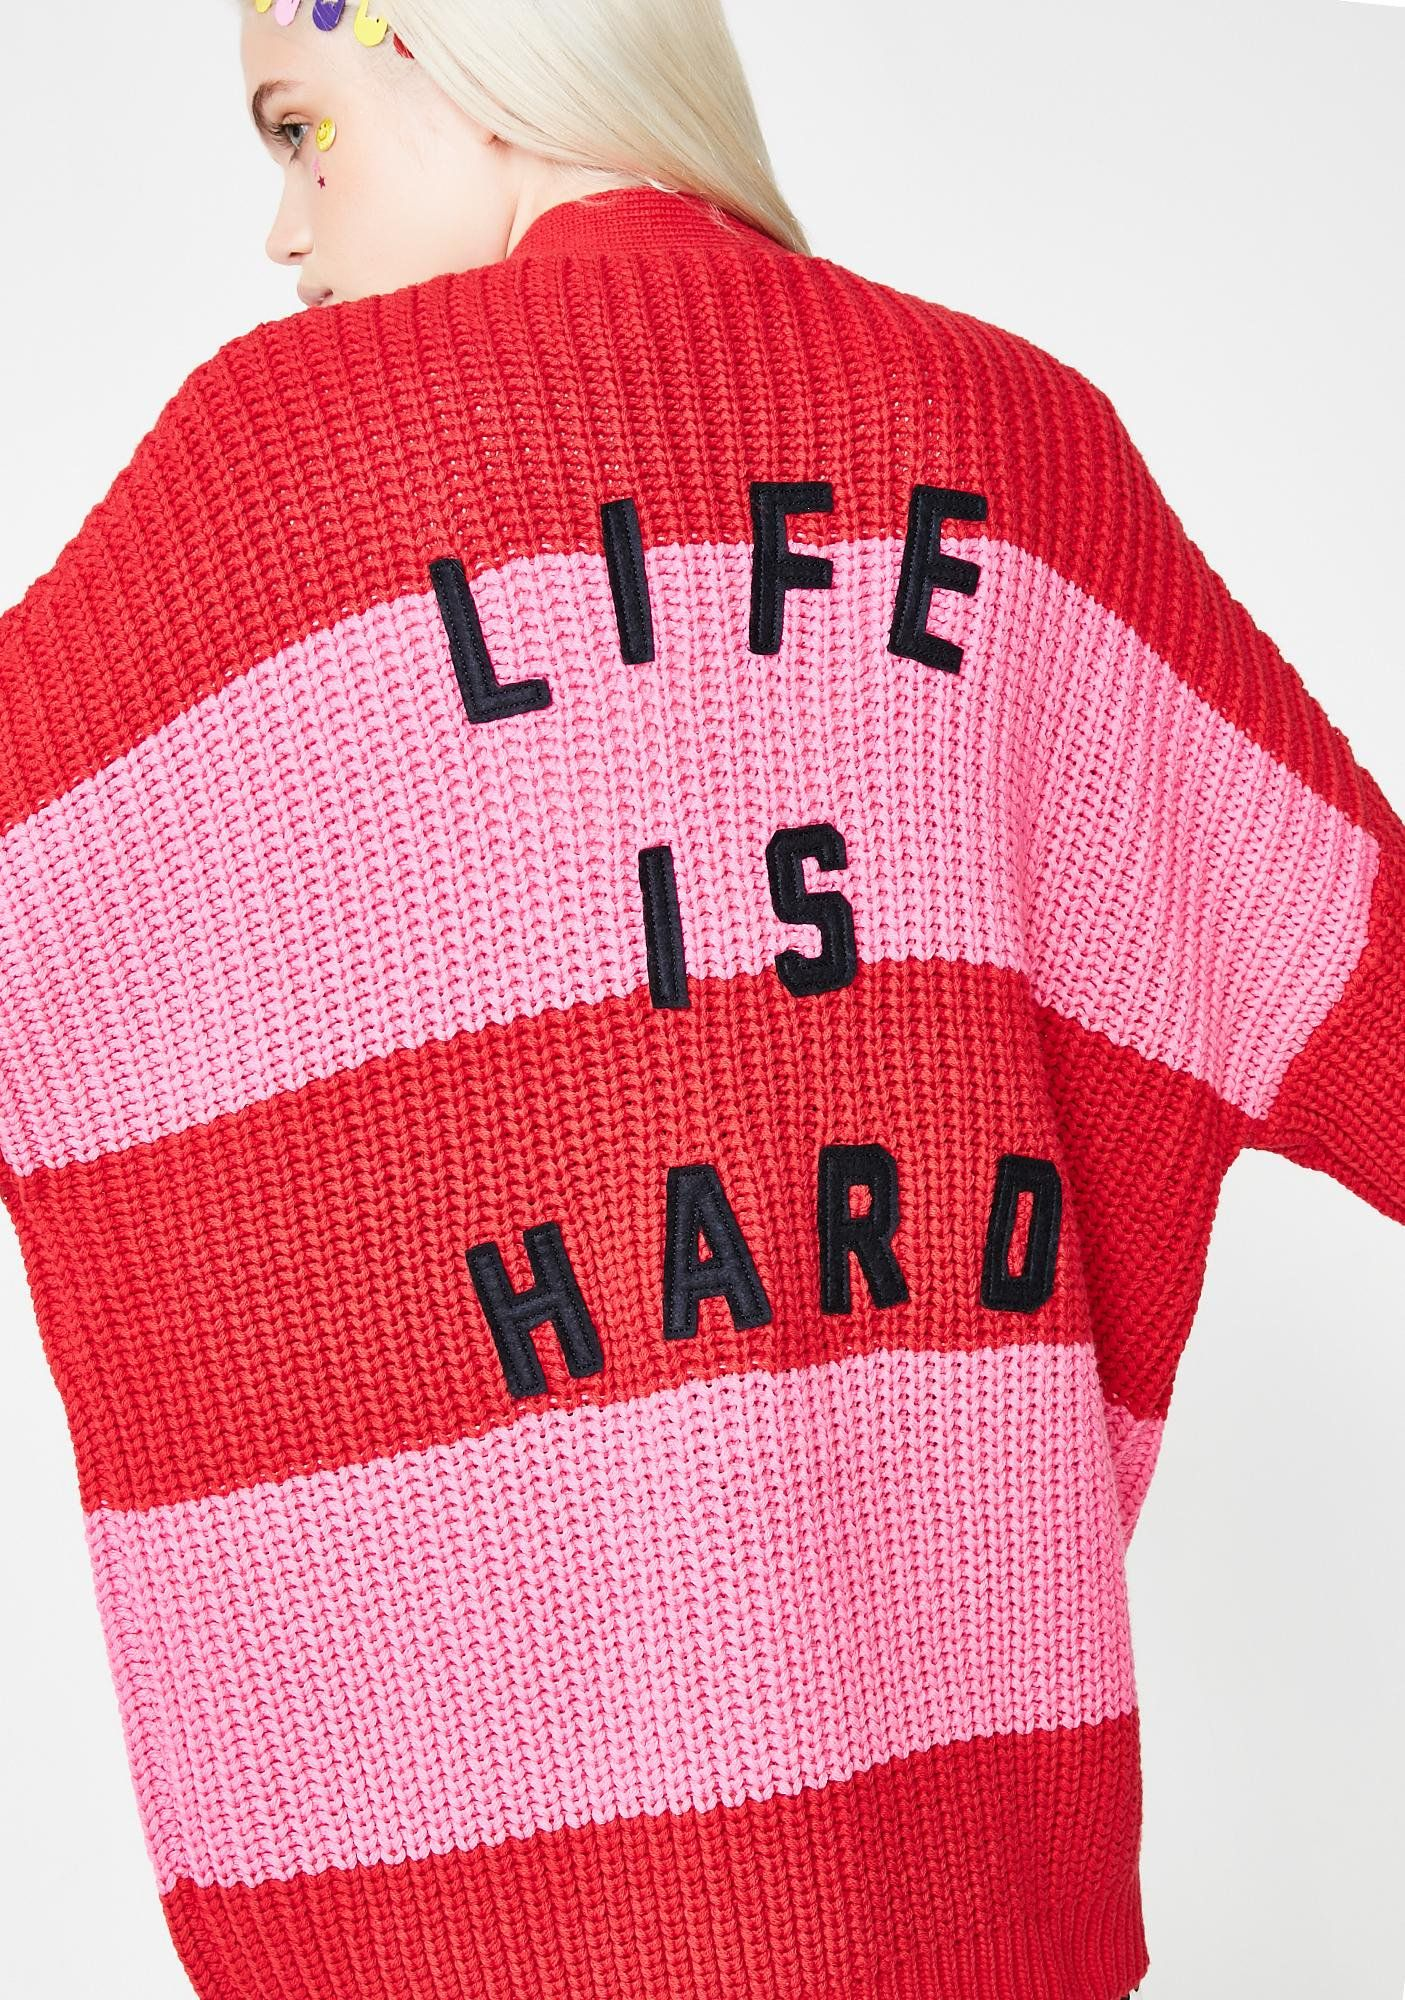 414b74ed22ca Life Is Hard Cardigan   Sweater Weather   Life is hard, Fashion ...